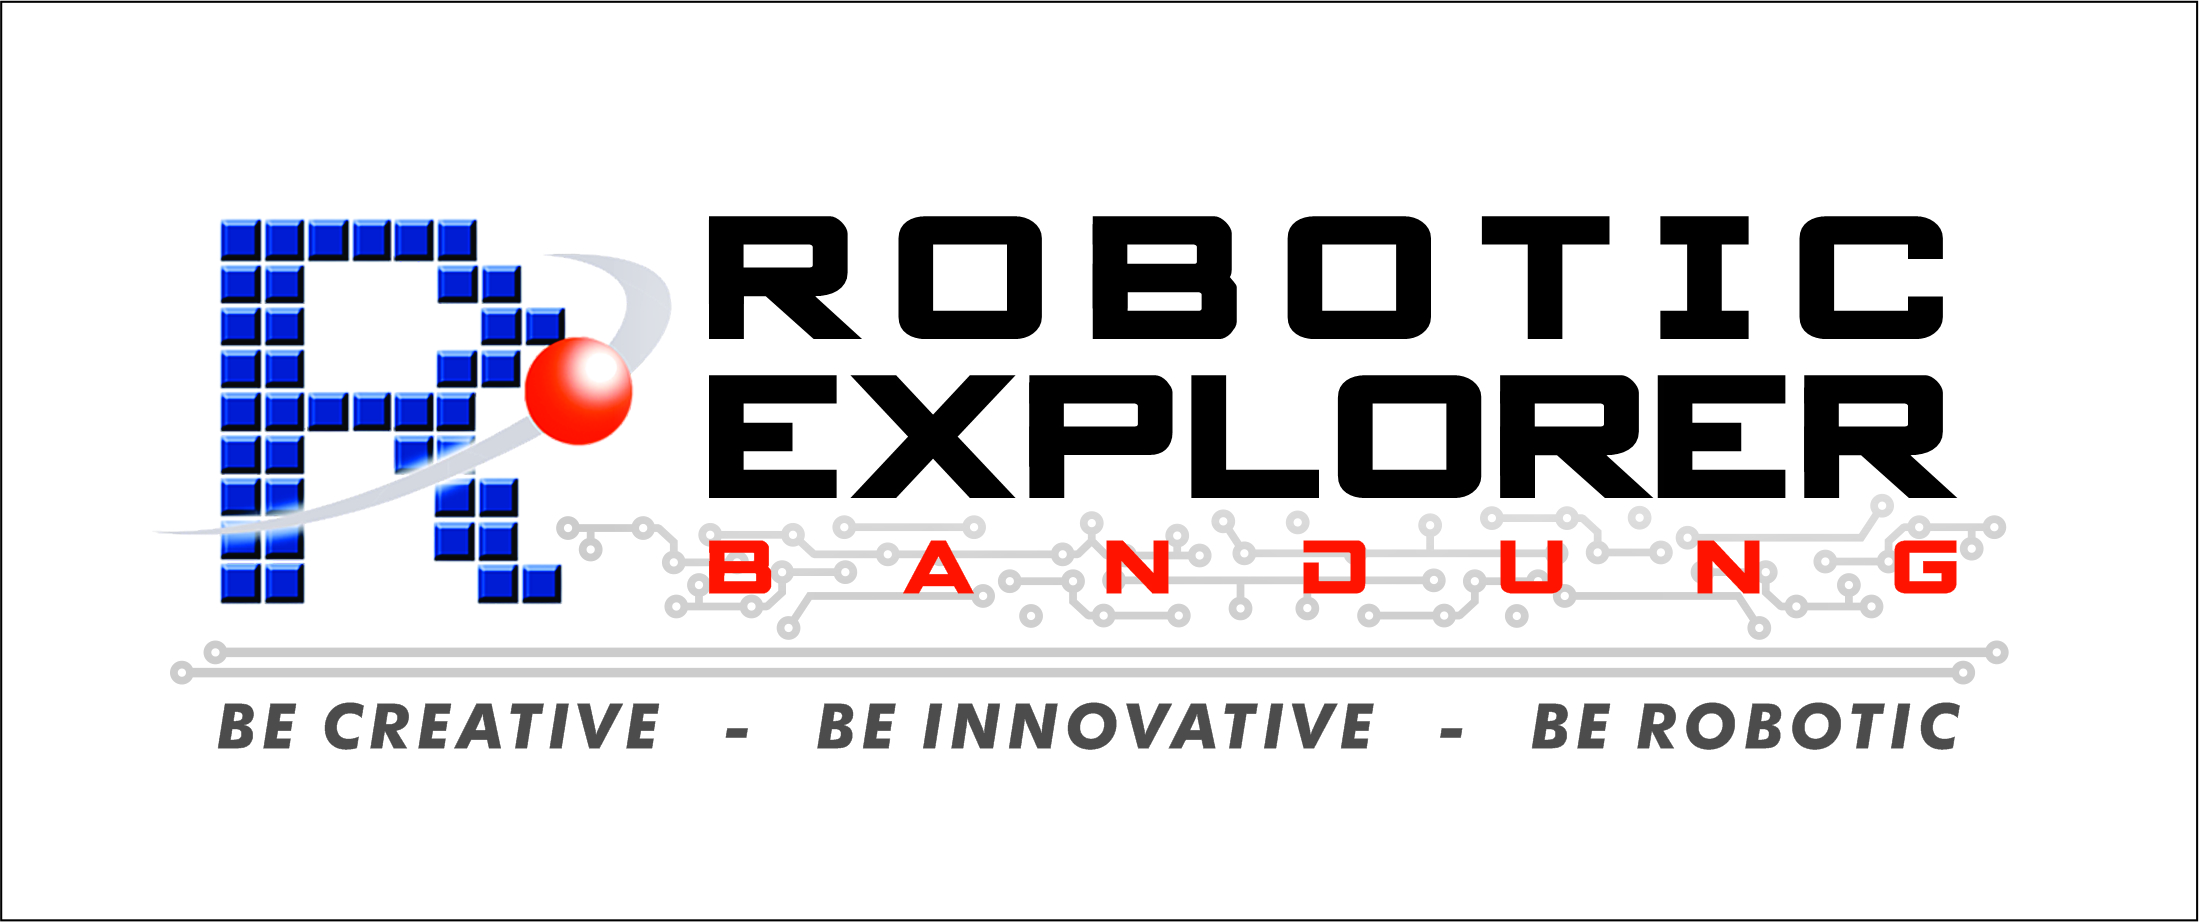 Robotic Explorer Bandung